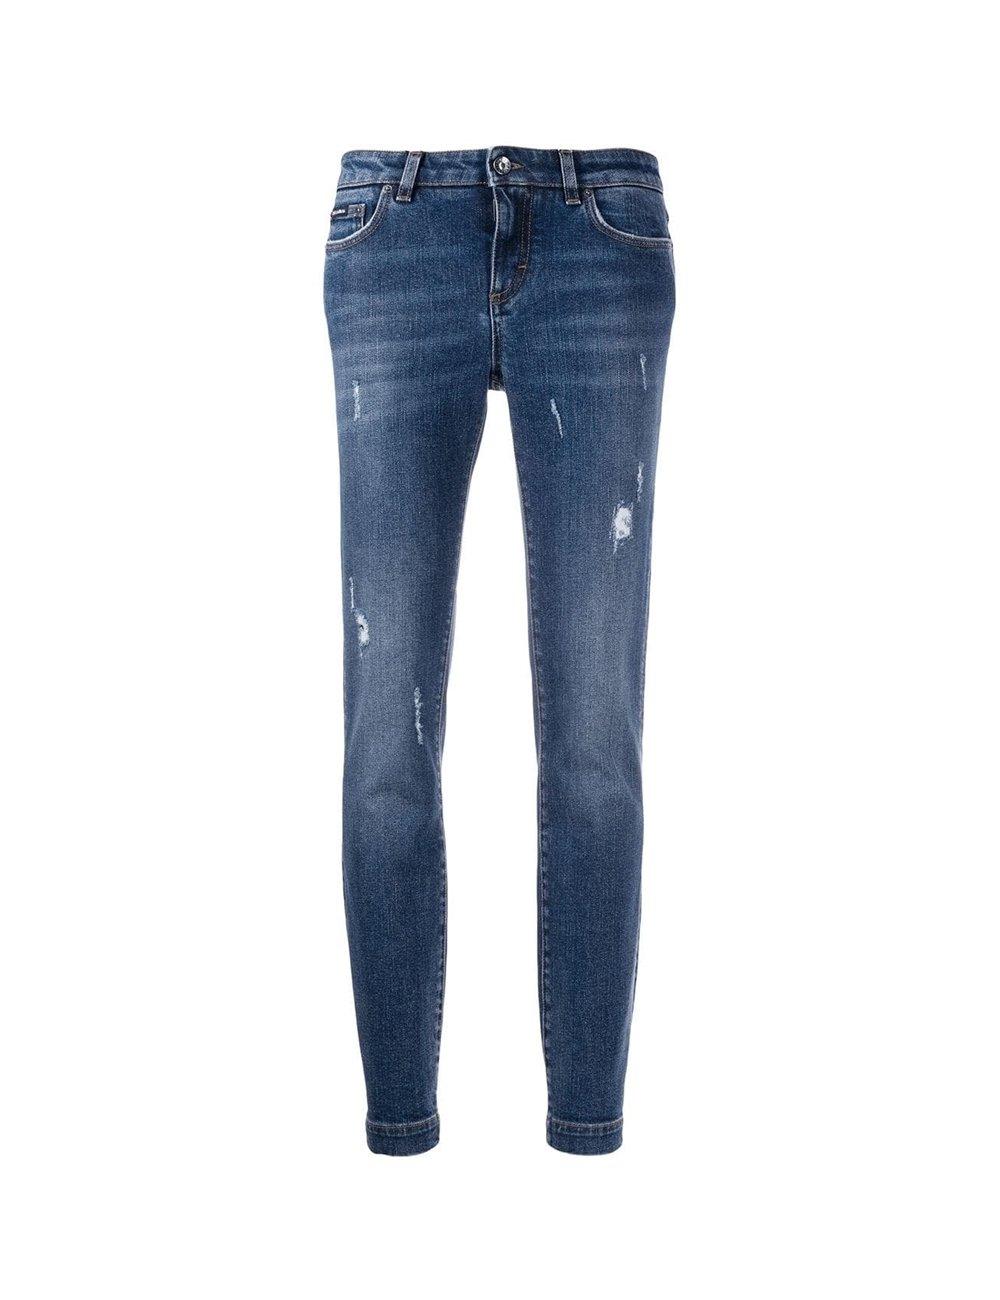 Jean slim Dolce& Gabbana - BIG BOSS MEGEVE